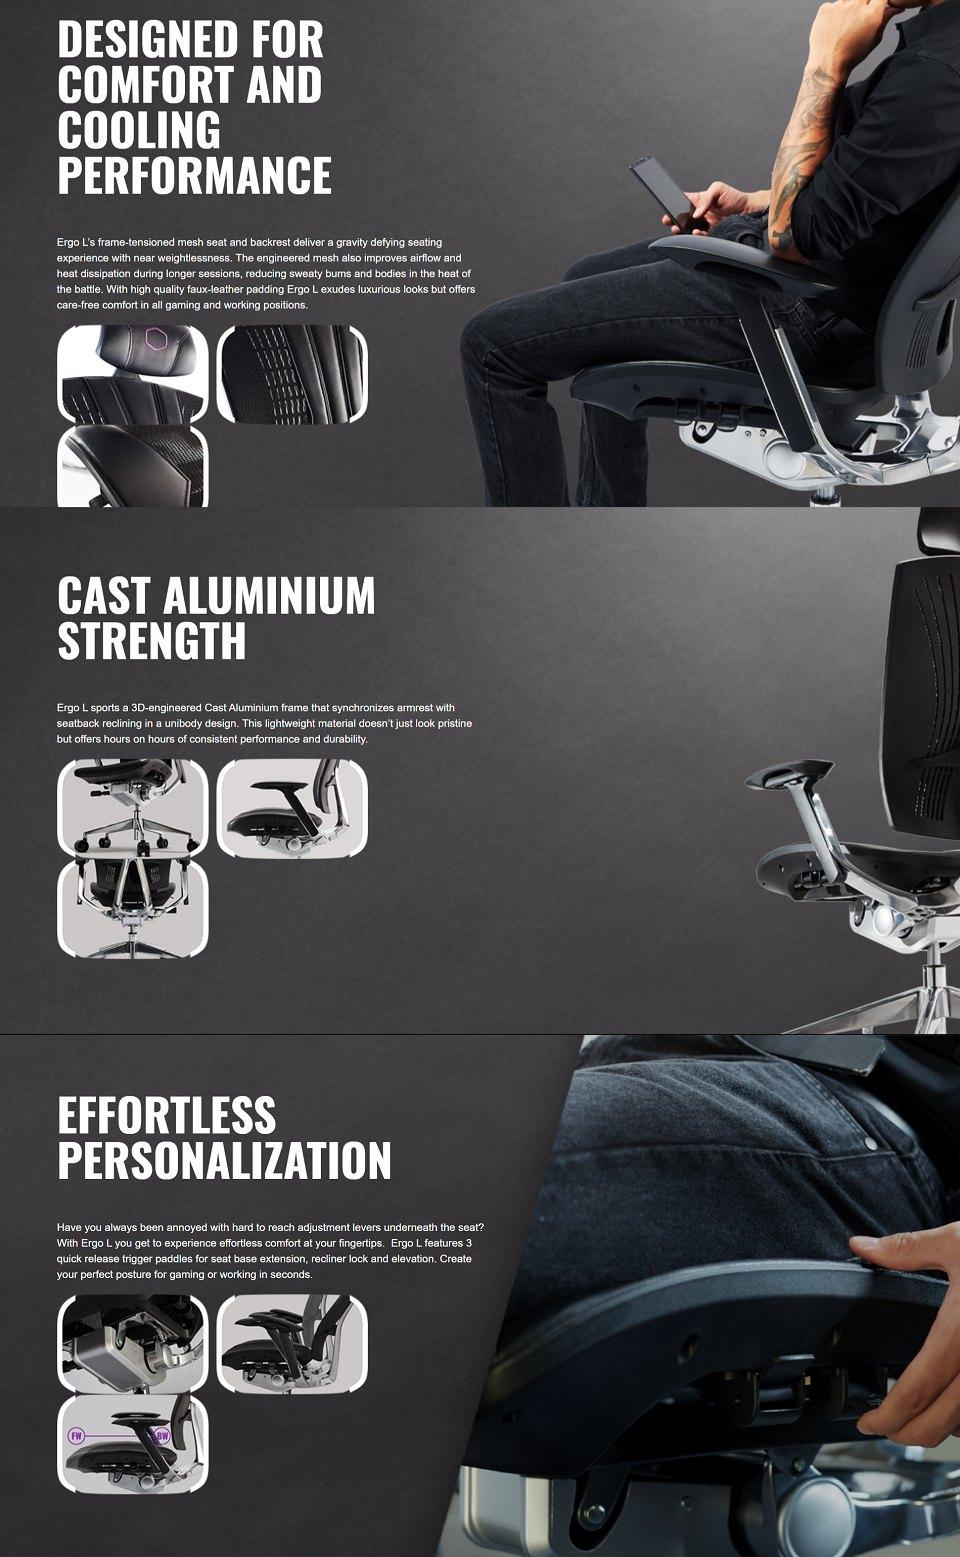 Cooler Master Ergo L Ergonomic Ultra Large Adjustable Chair features